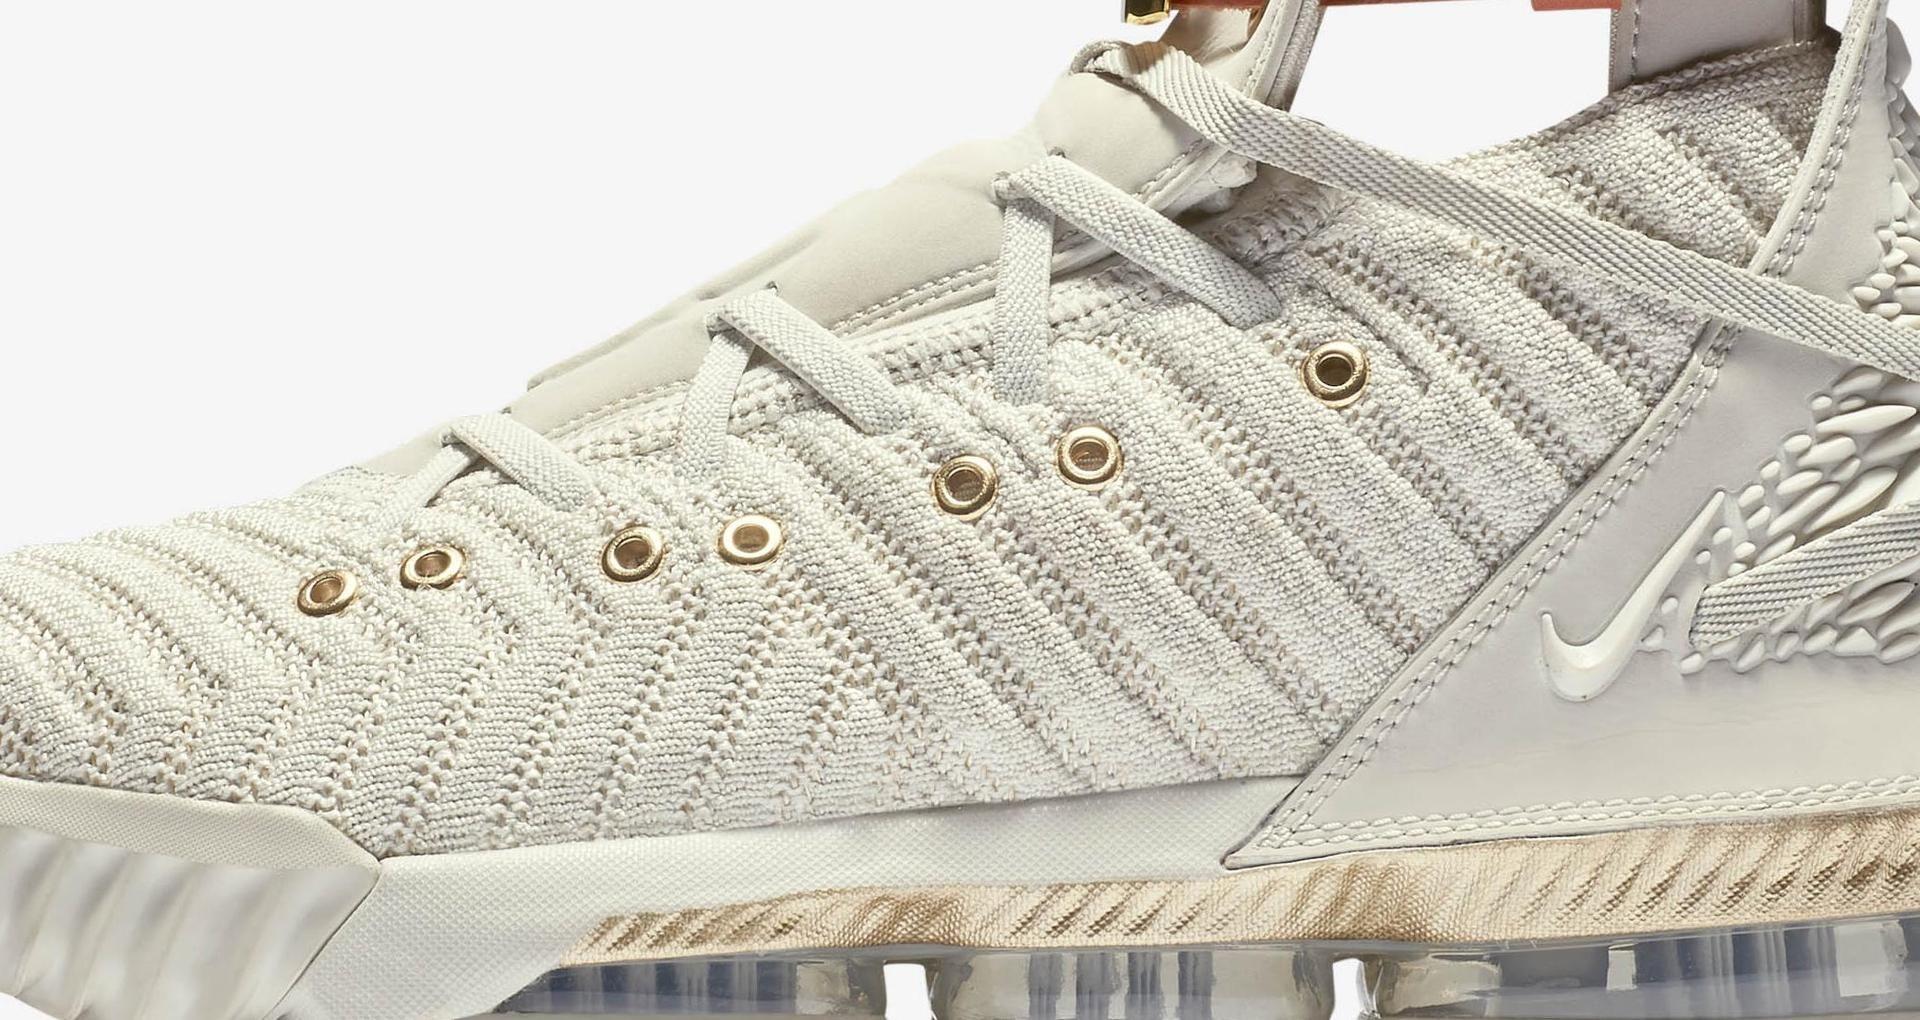 timeless design e92b9 23fa5 Women's Lebron 16 HFR 'White & Sail' Release Date. Nike+ SNKRS